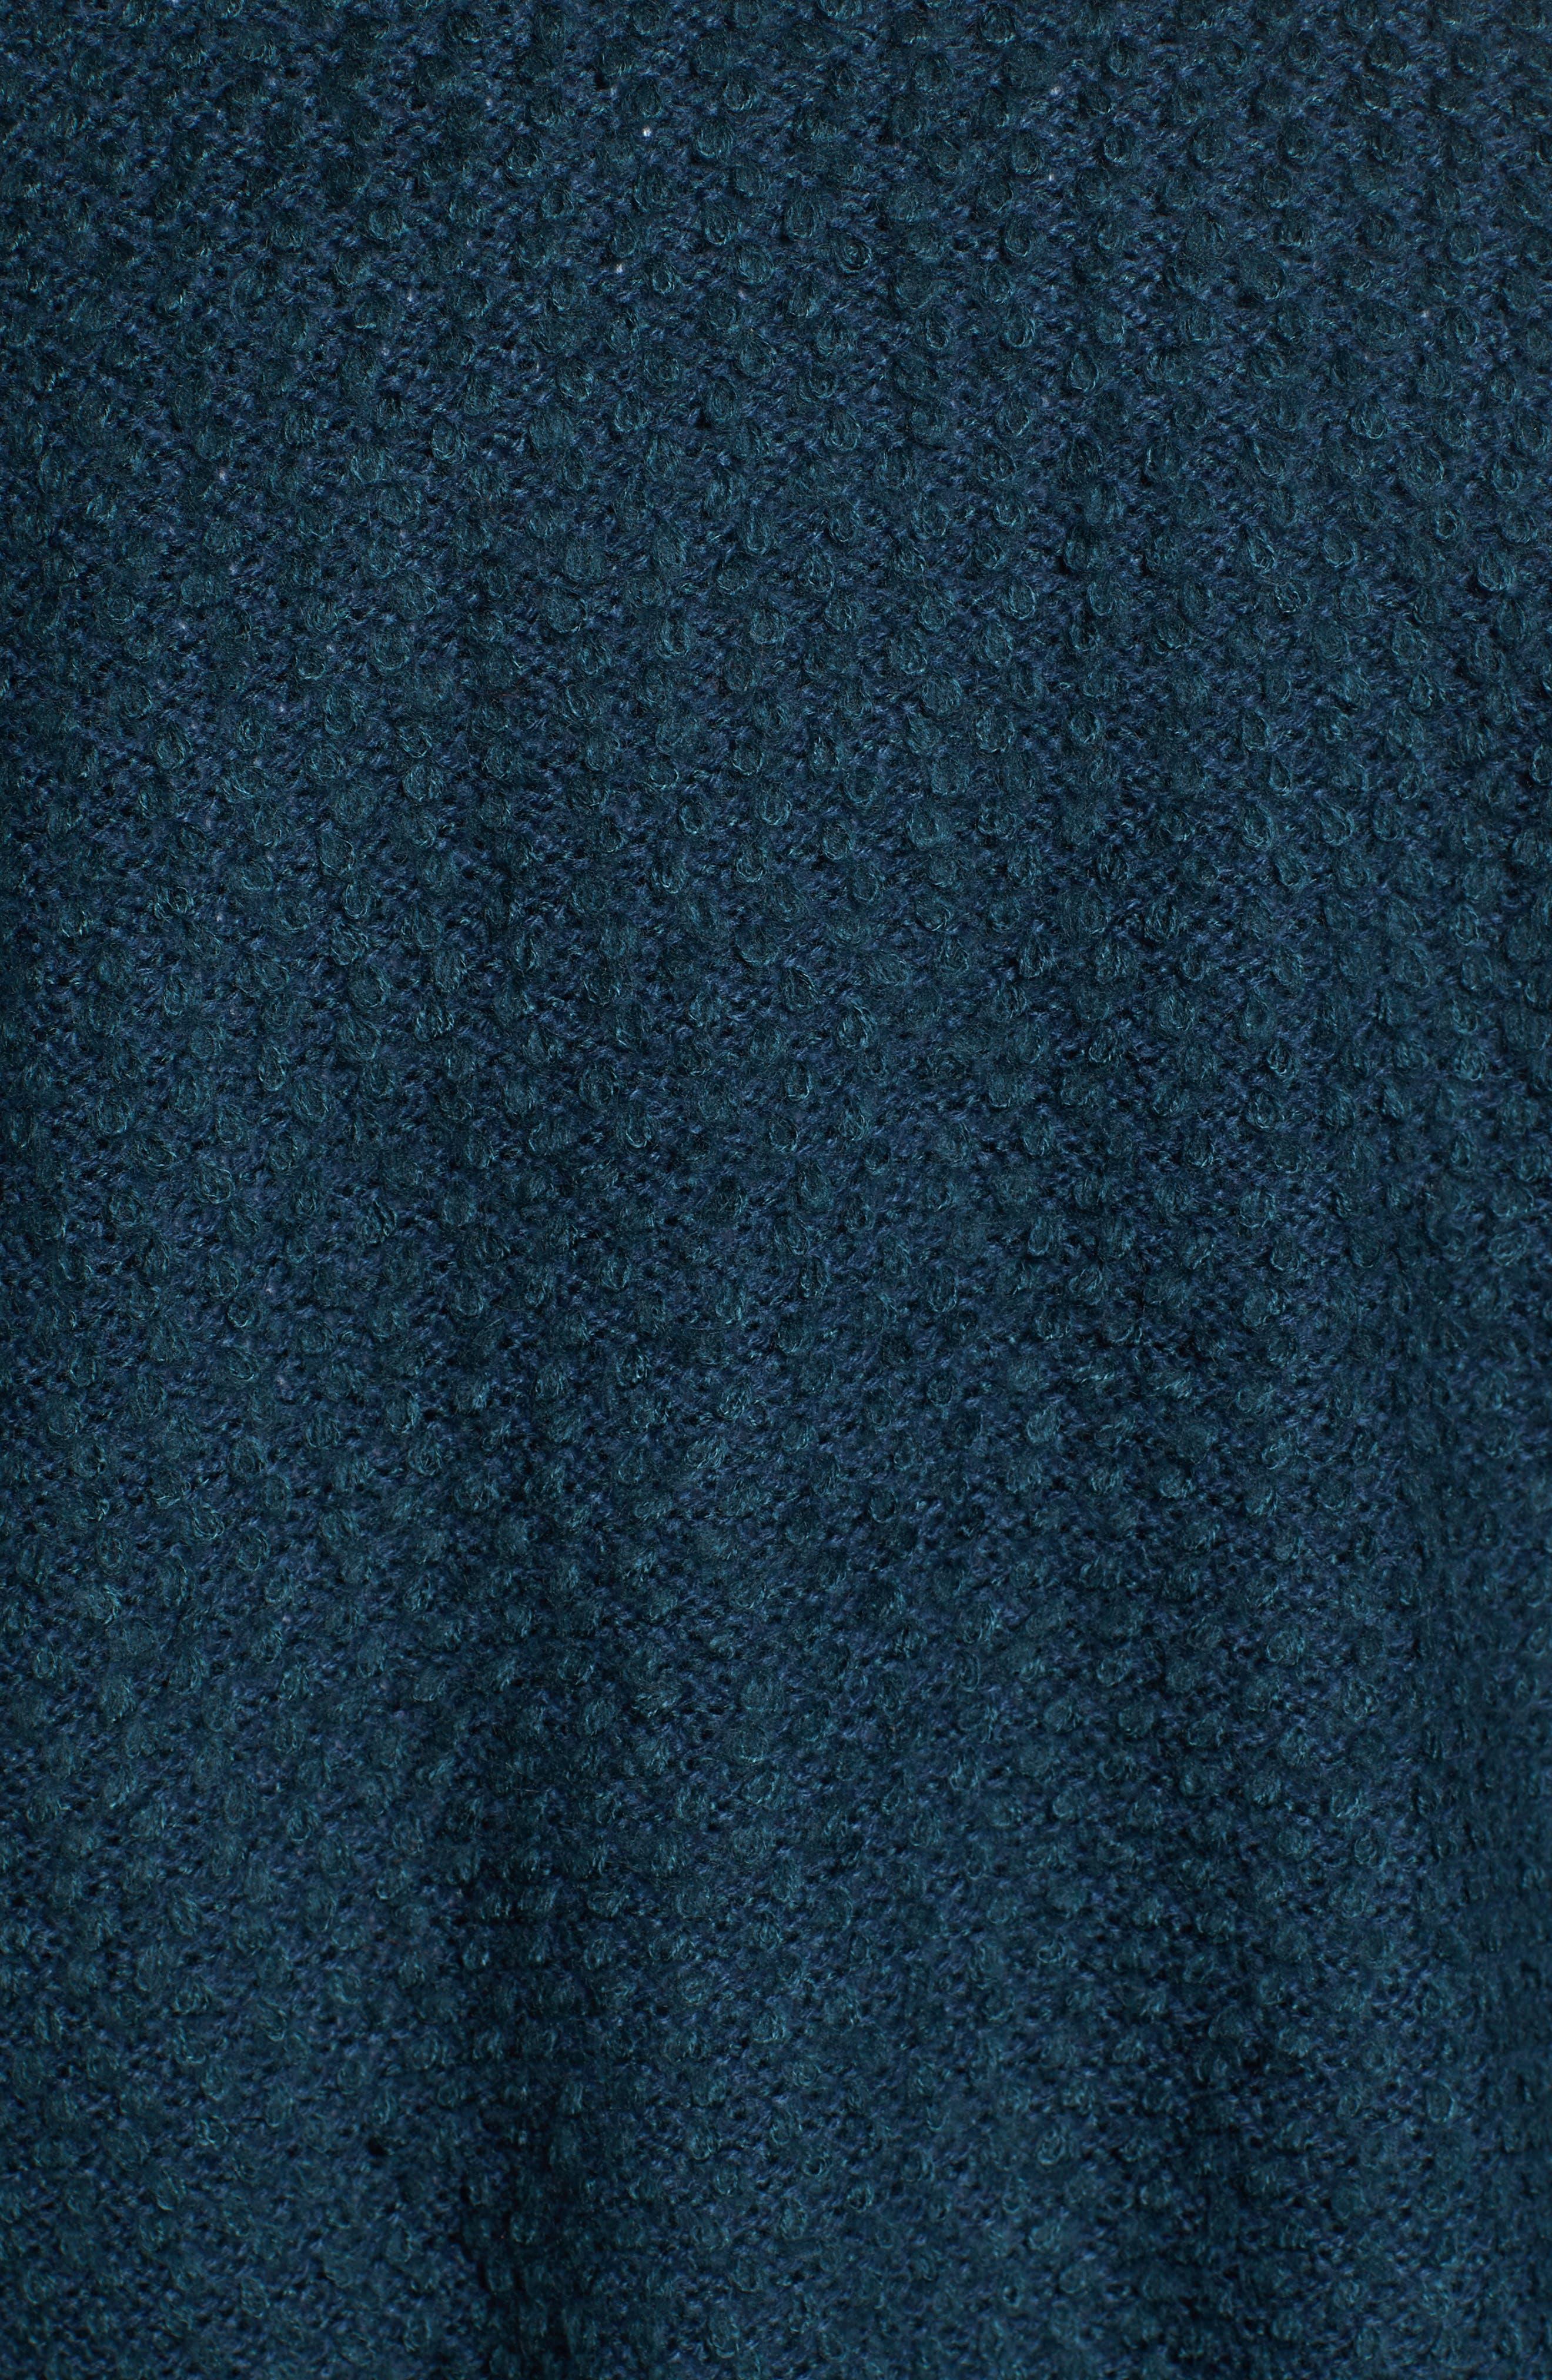 Popcorn Stitch Cardigan,                             Alternate thumbnail 5, color,                             440